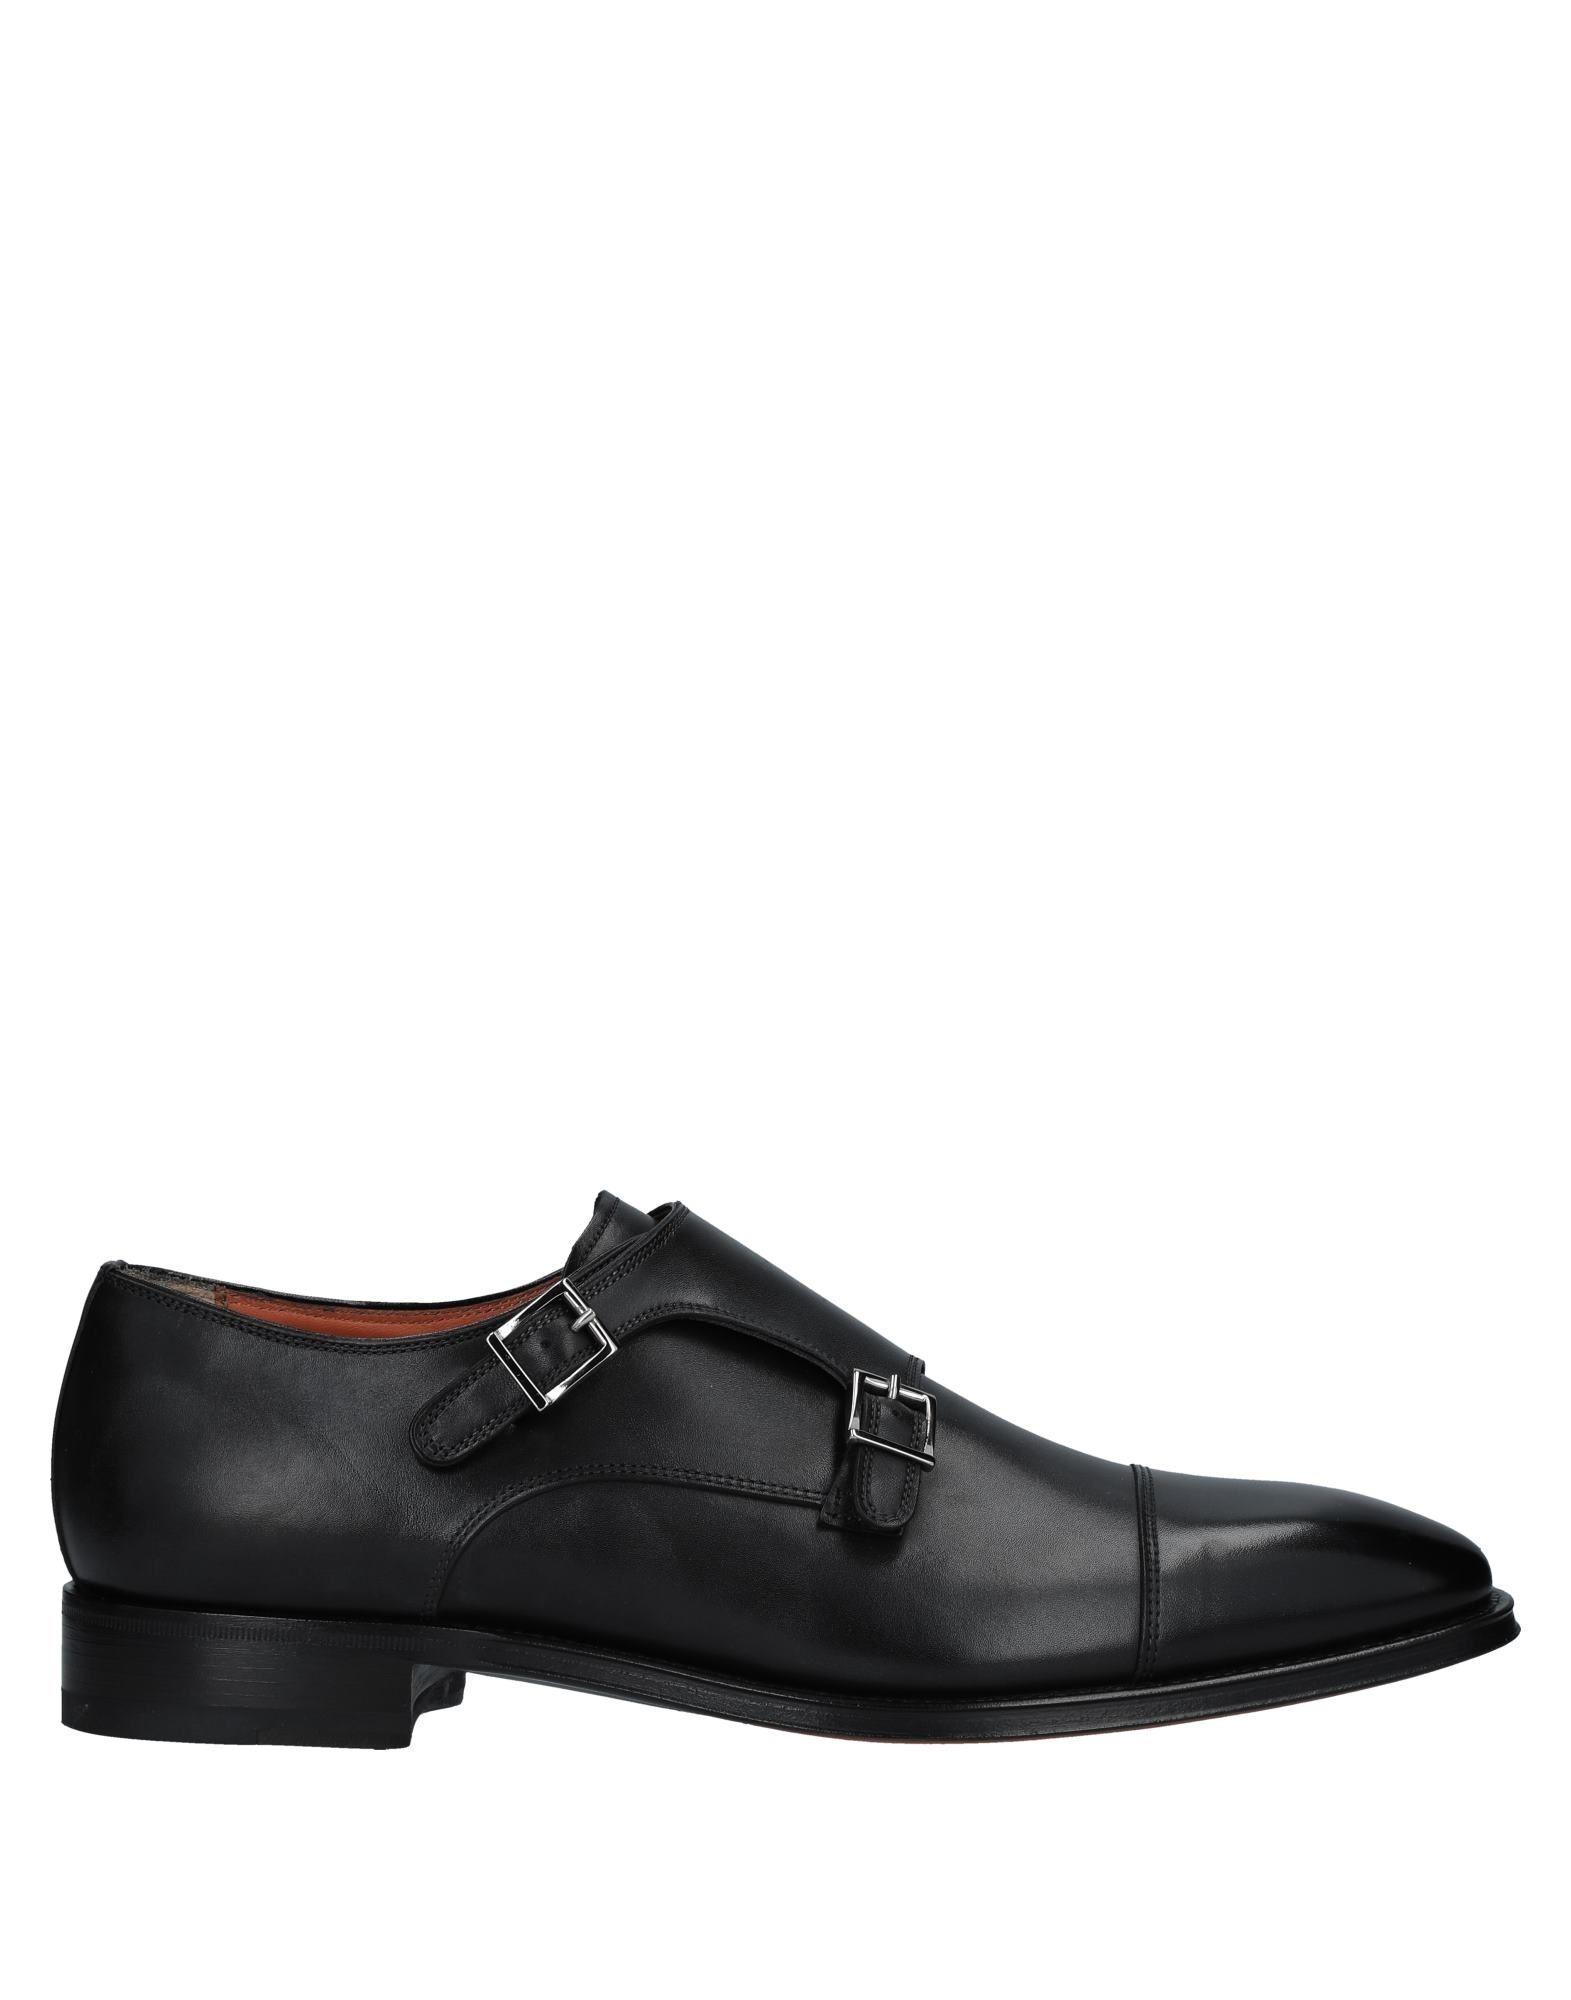 Santoni Mokassins Herren  11528417VP Gute Qualität beliebte Schuhe